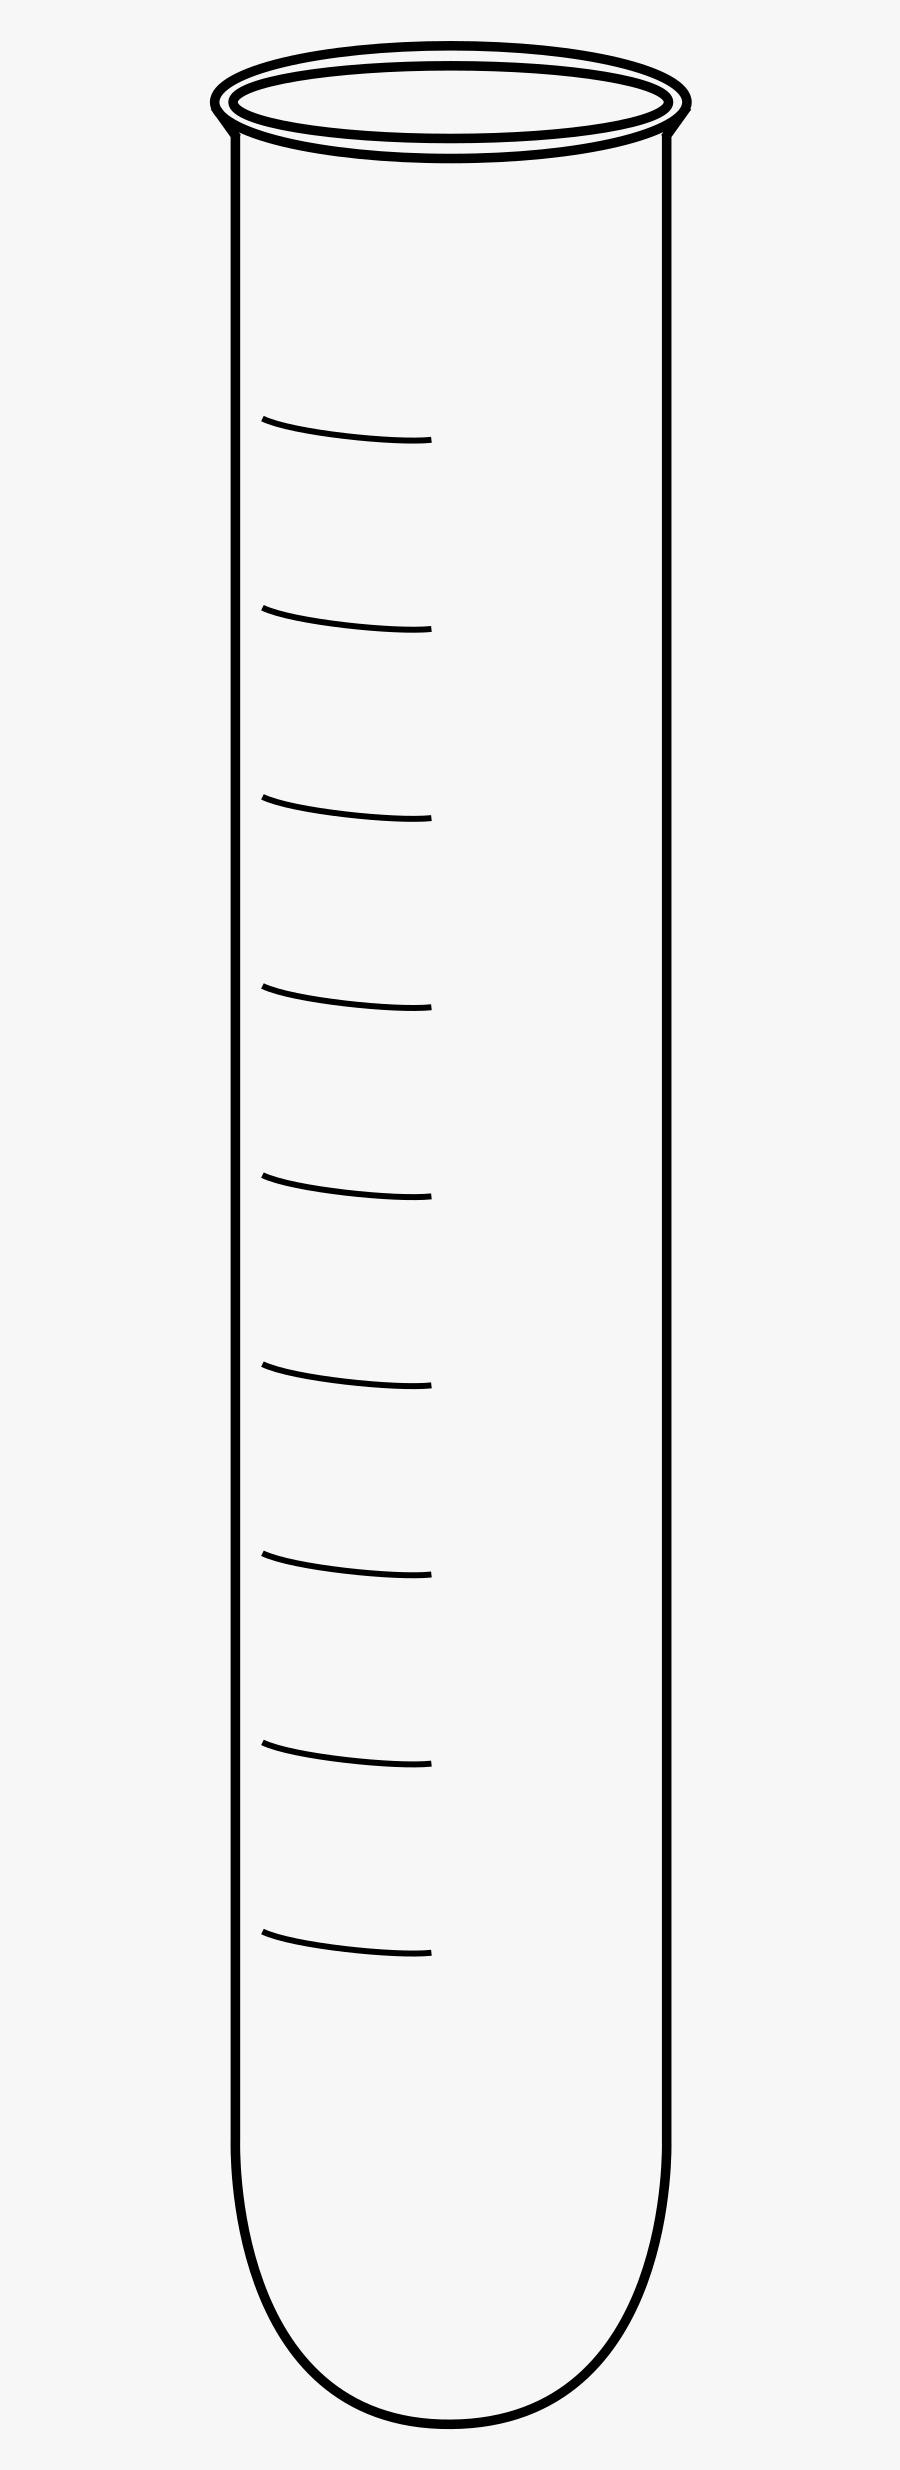 Reagenzglas Leer Skala Clipart - Black And White Empty Test Tube Clip Art, Transparent Clipart